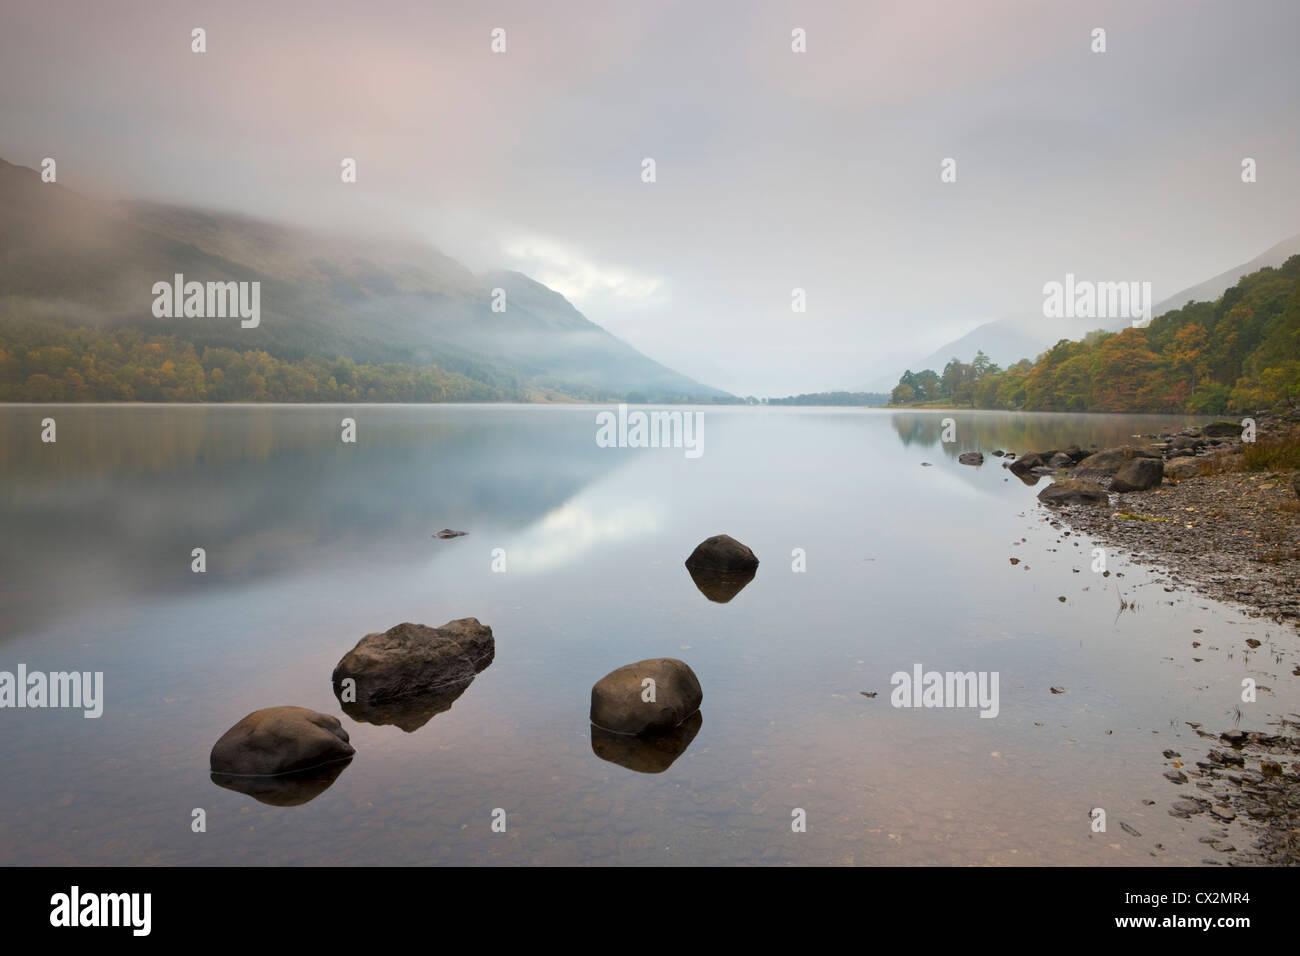 Loch Voil shrouded in mist at dawn, Balquhidder, Loch Lomond and The Trossachs, Scotland - Stock Image